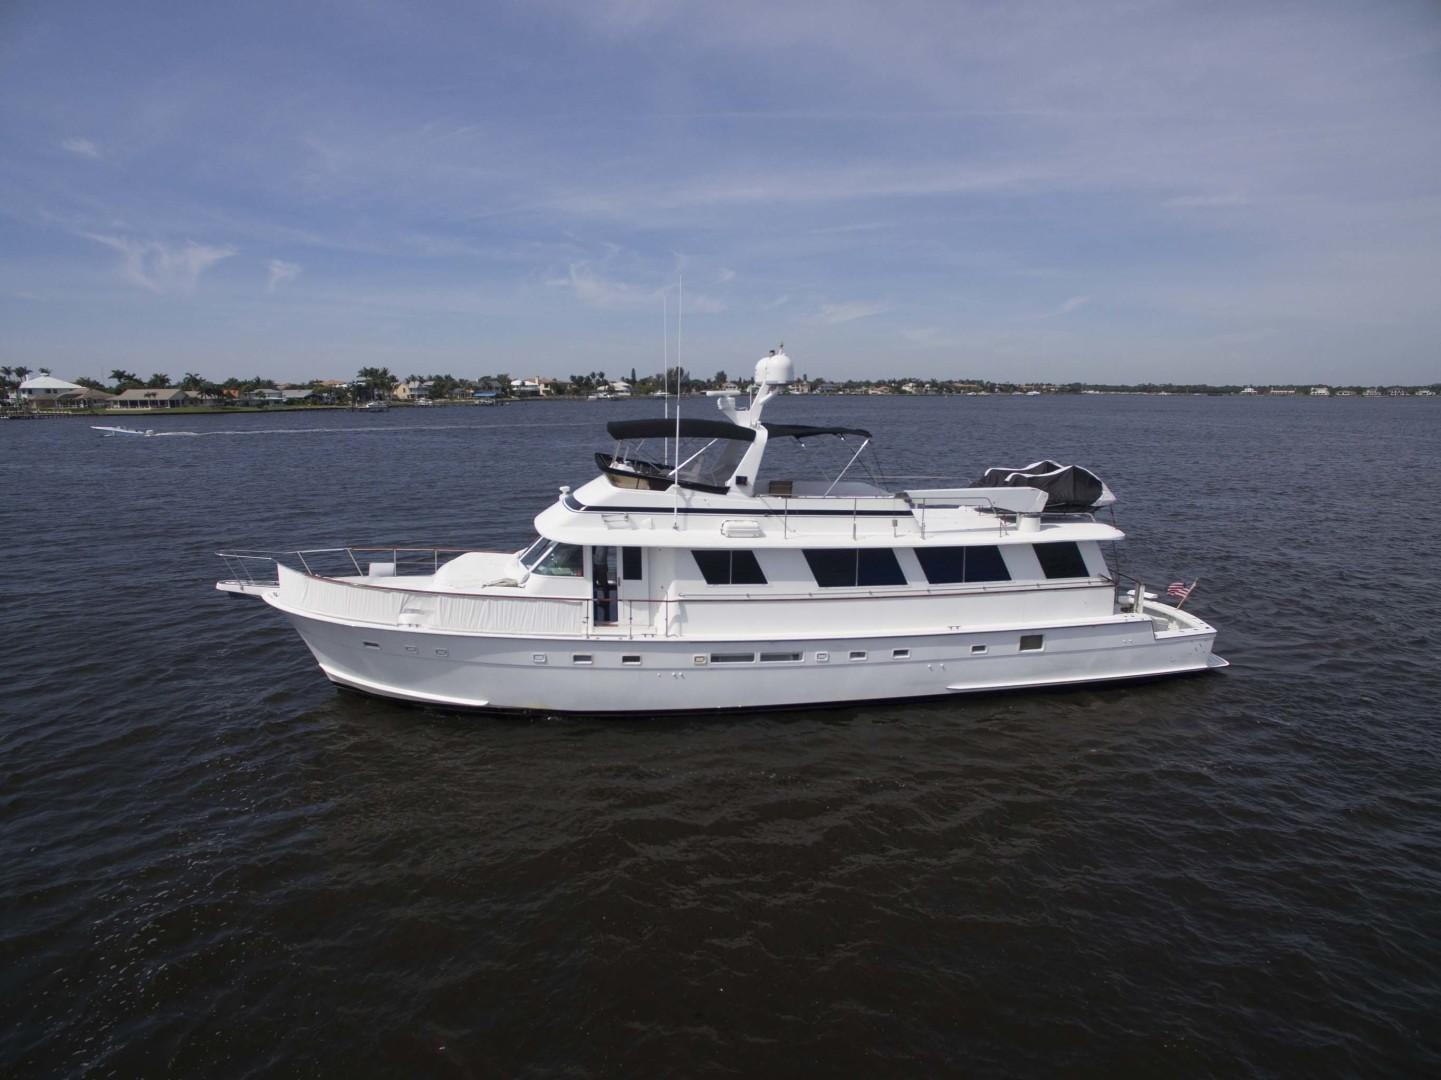 Hatteras-Motoryacht 1987-Christie Lee Stuart-Florida-United States-Port View-1392660   Thumbnail